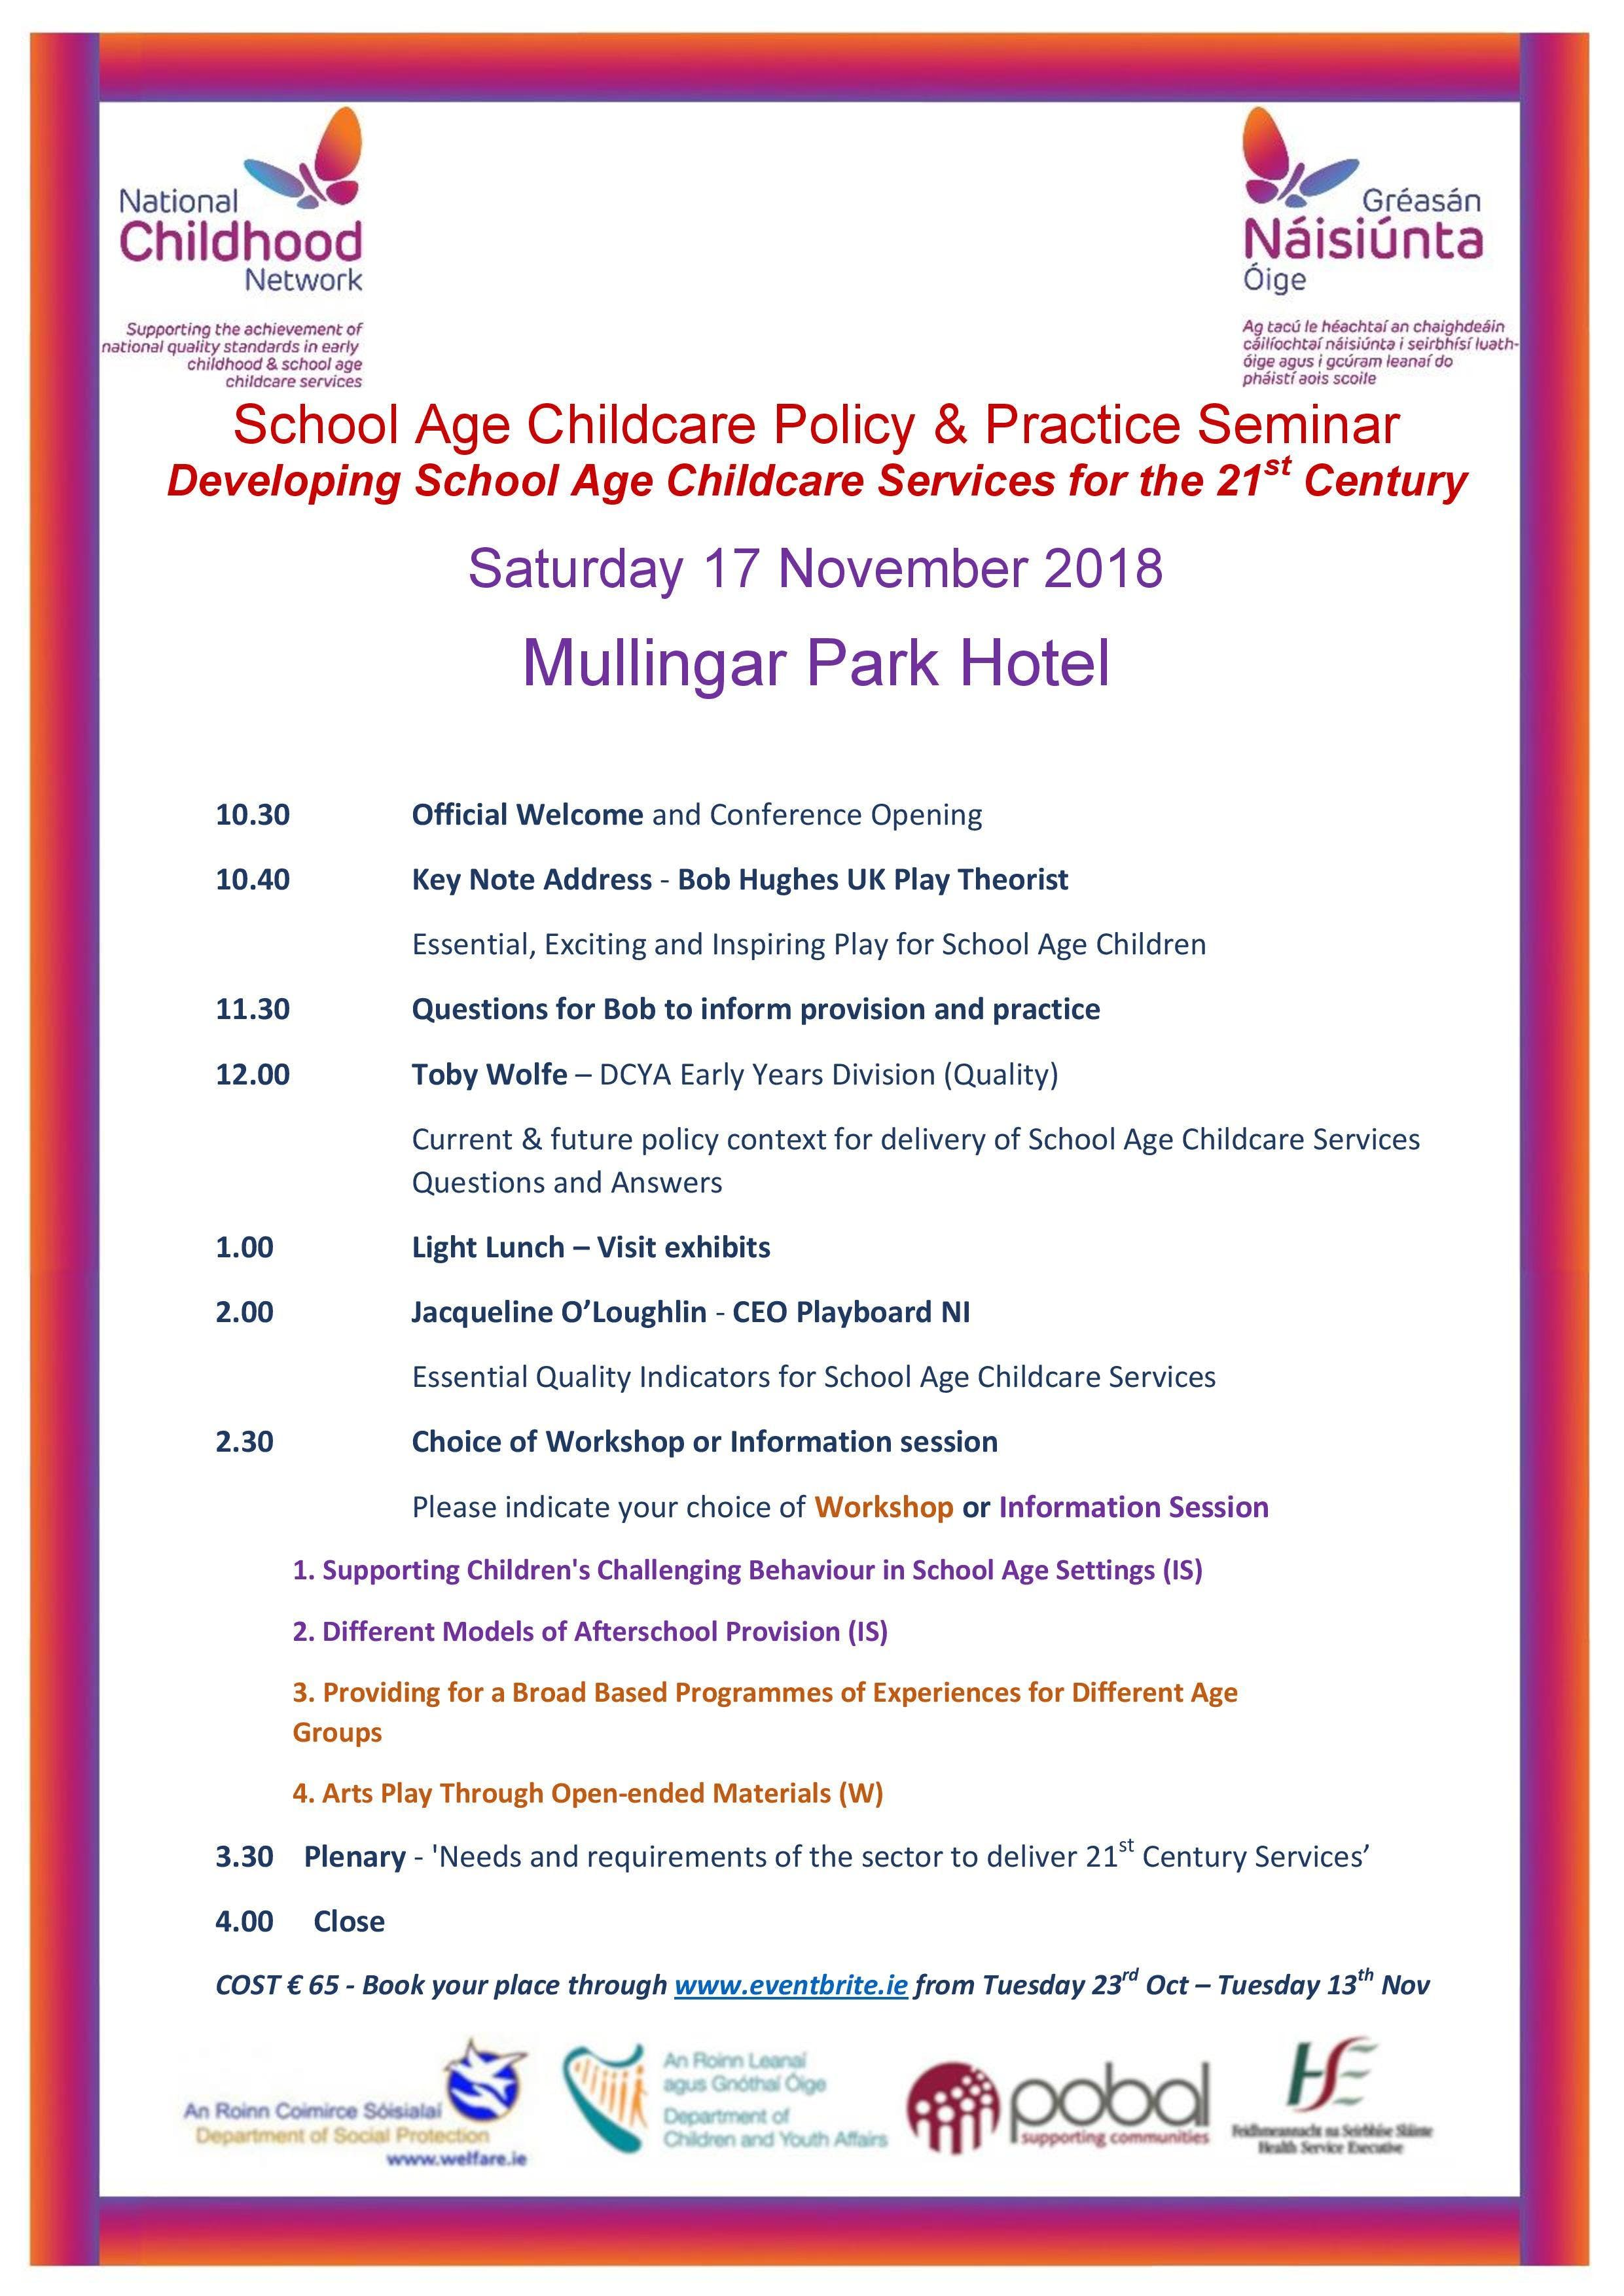 School Age Childcare Policy & Practice Seminar